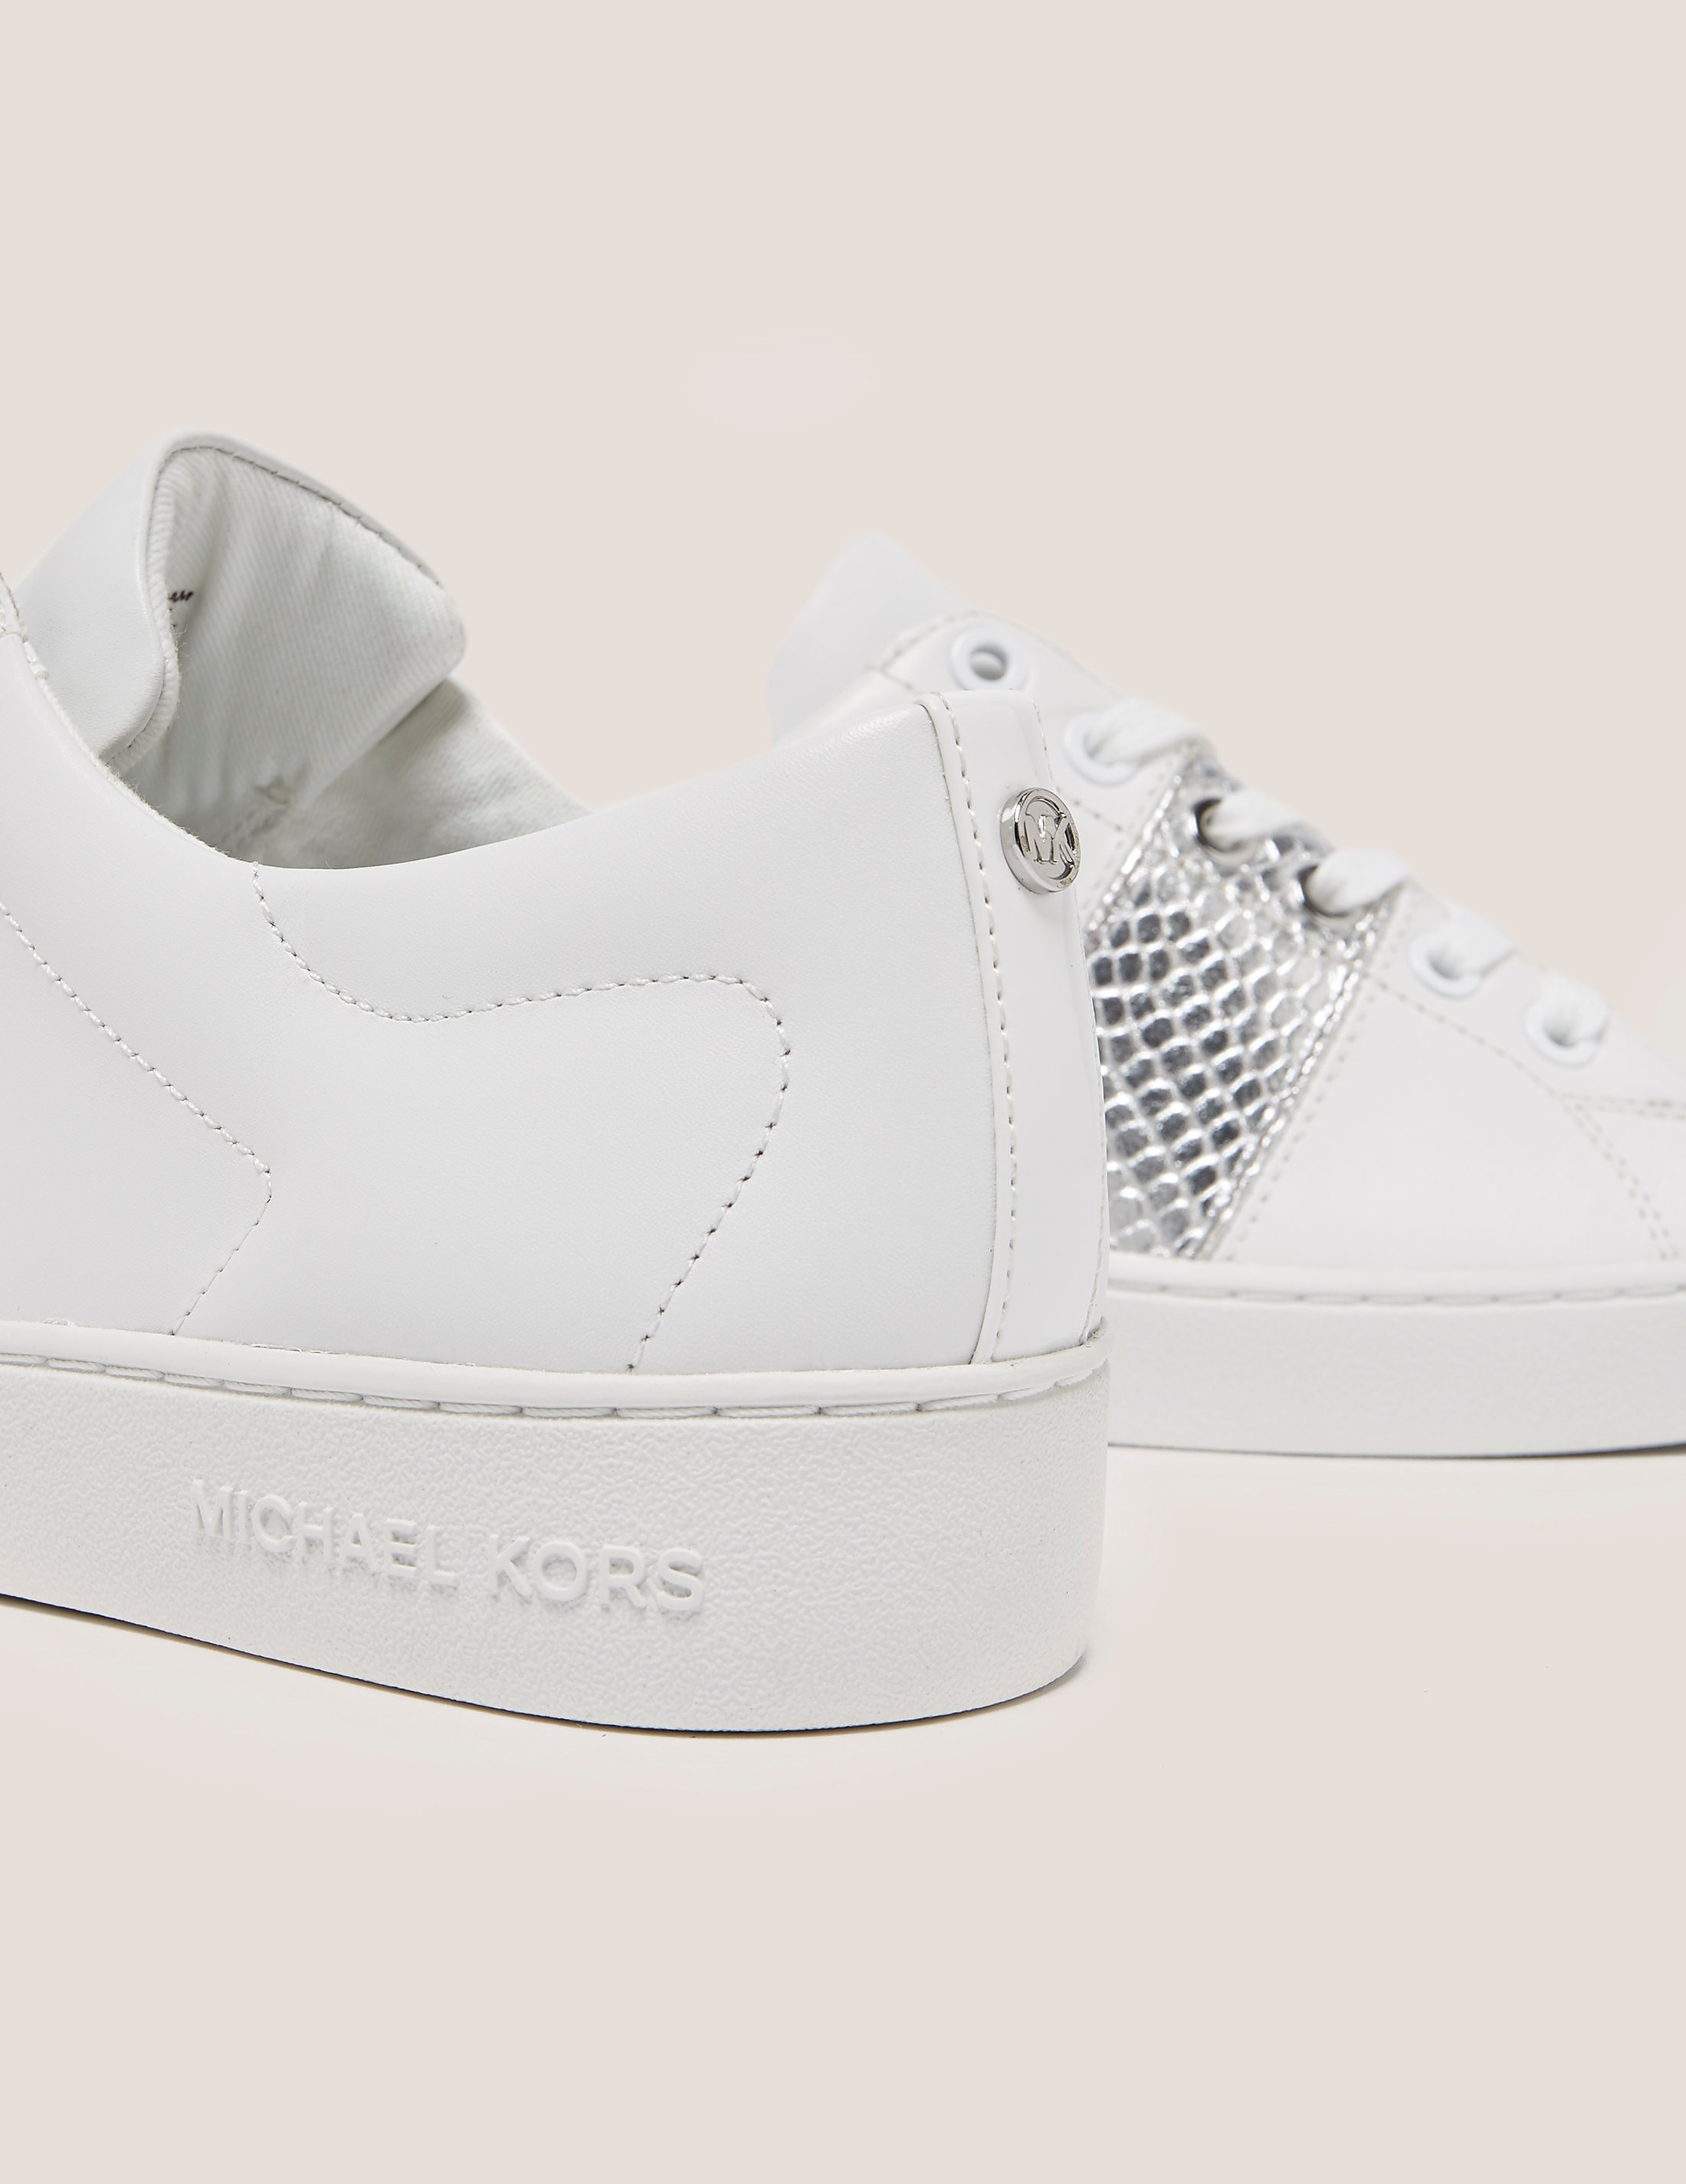 Michael Kors Brady Sneakers